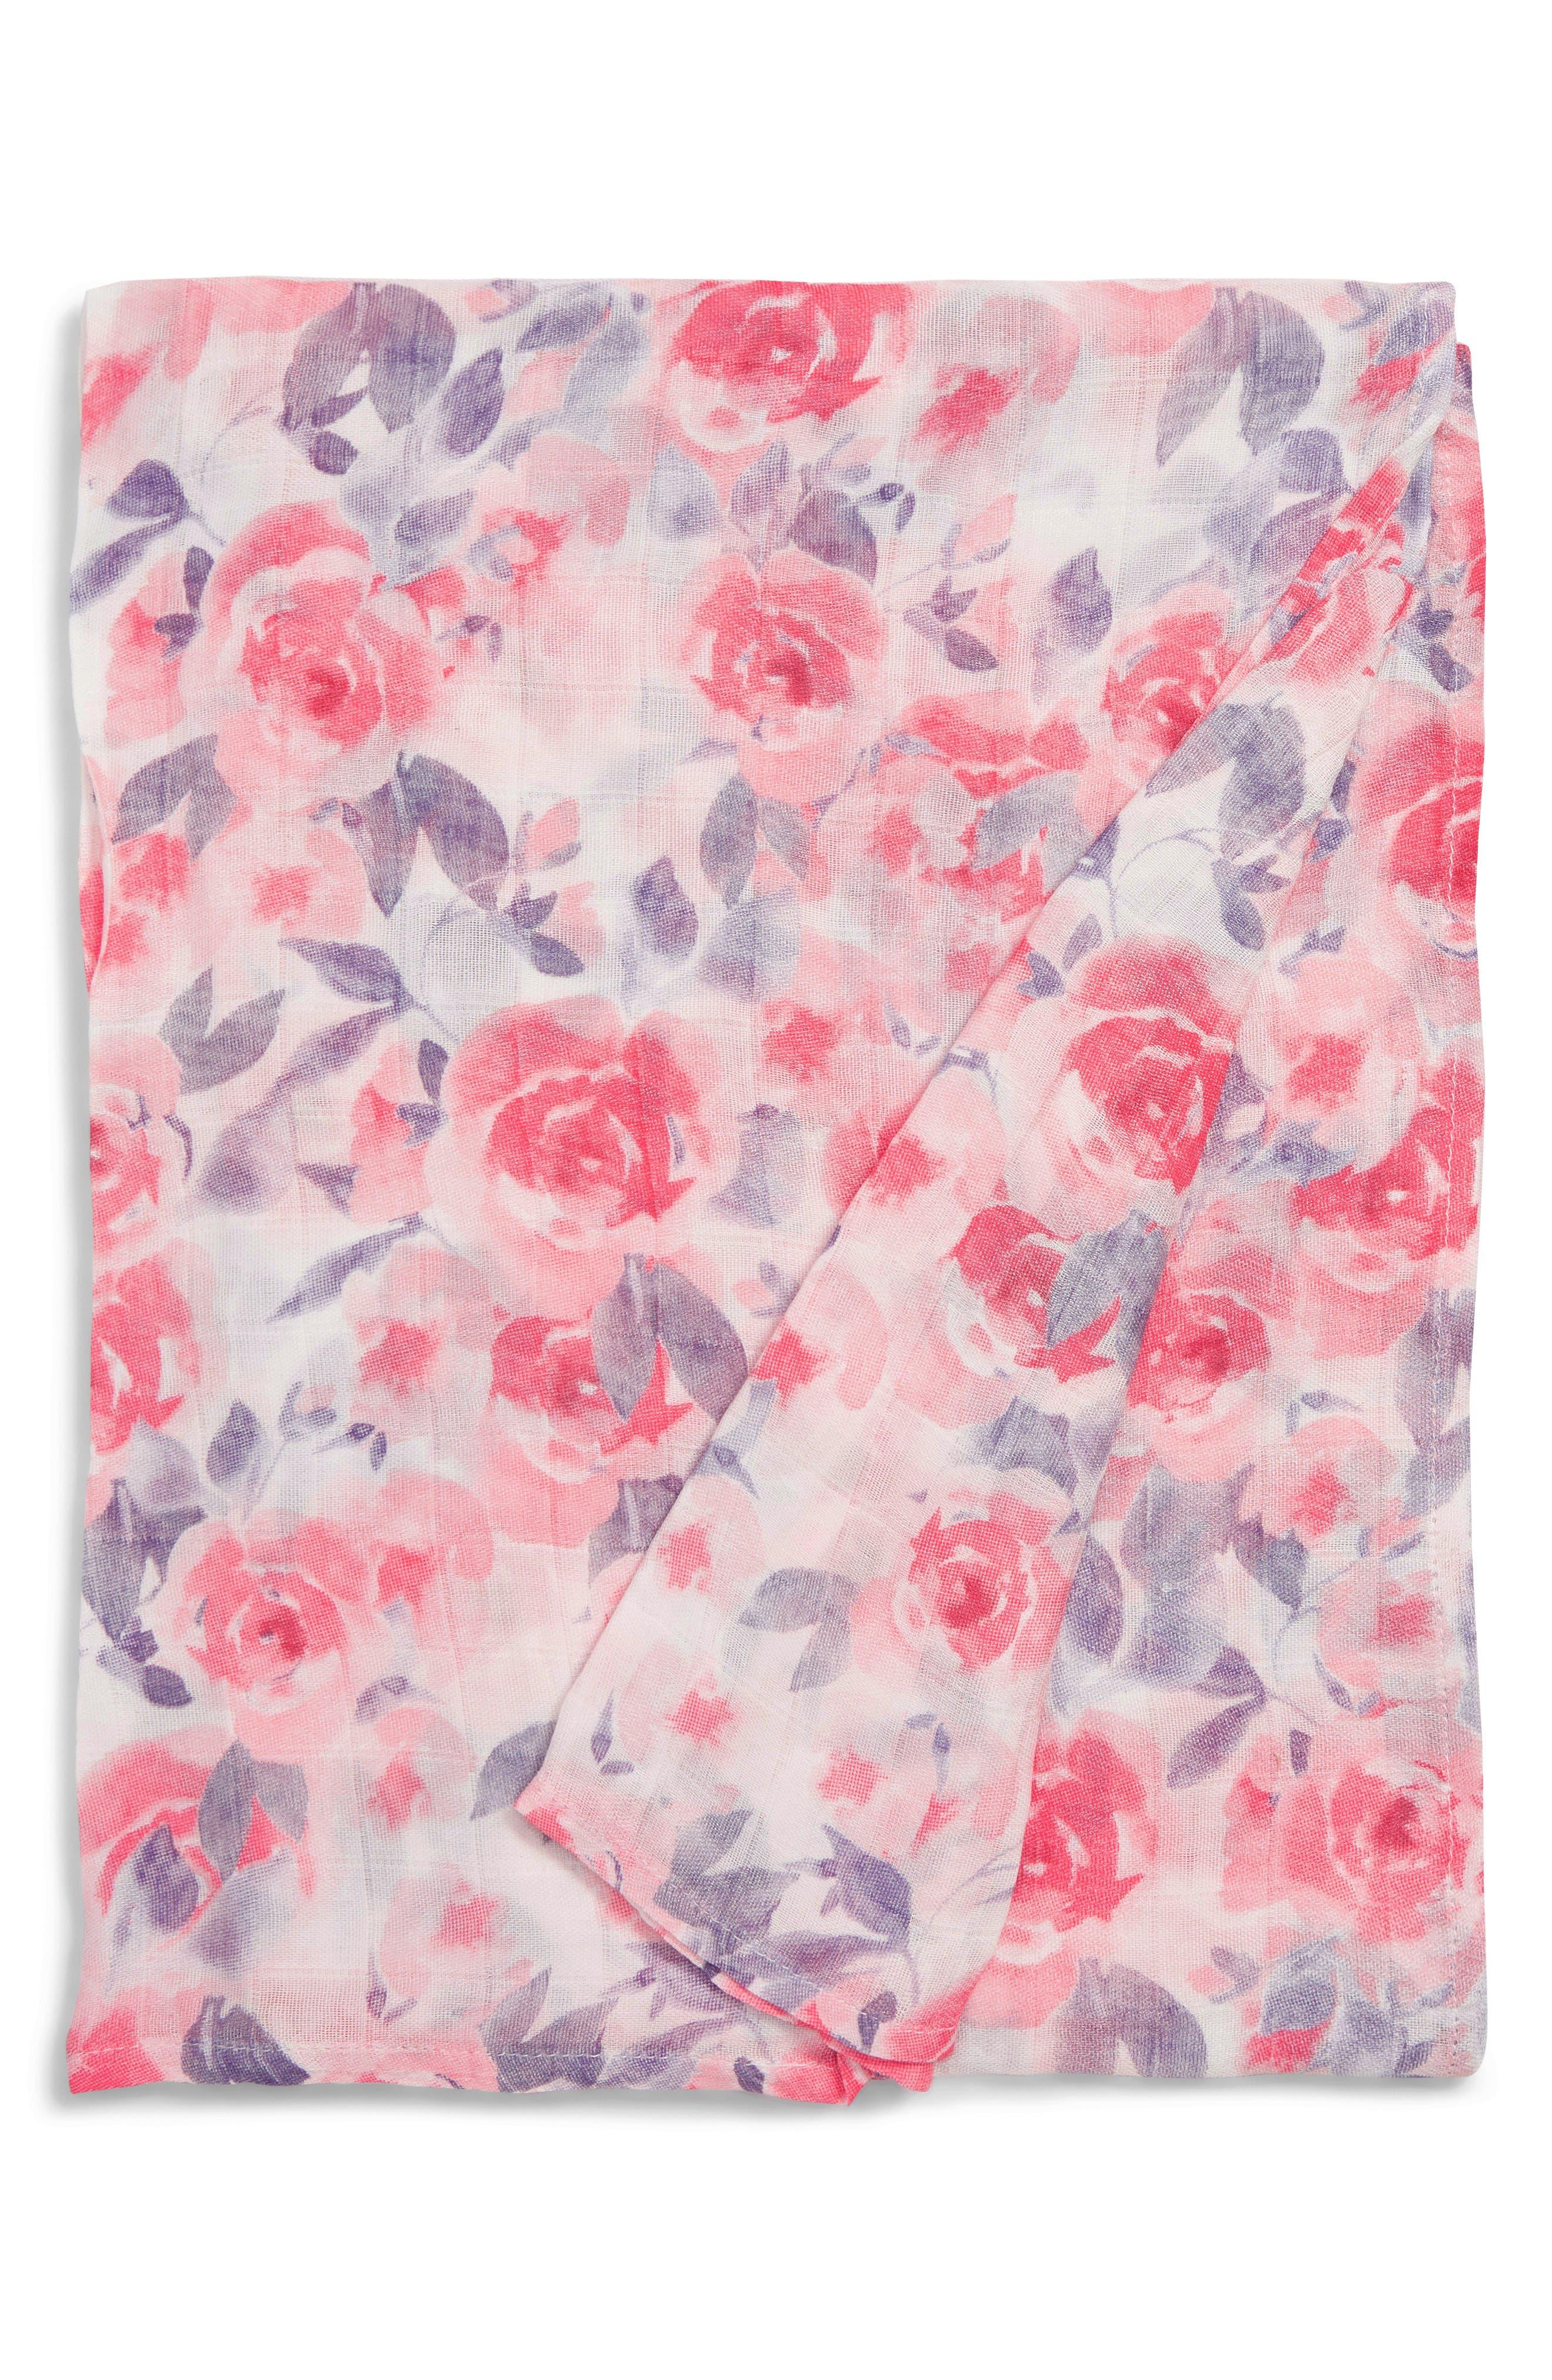 Aden  Anais White Label Stargaze Silky Soft Swaddling Cloth Size One Size  Pink